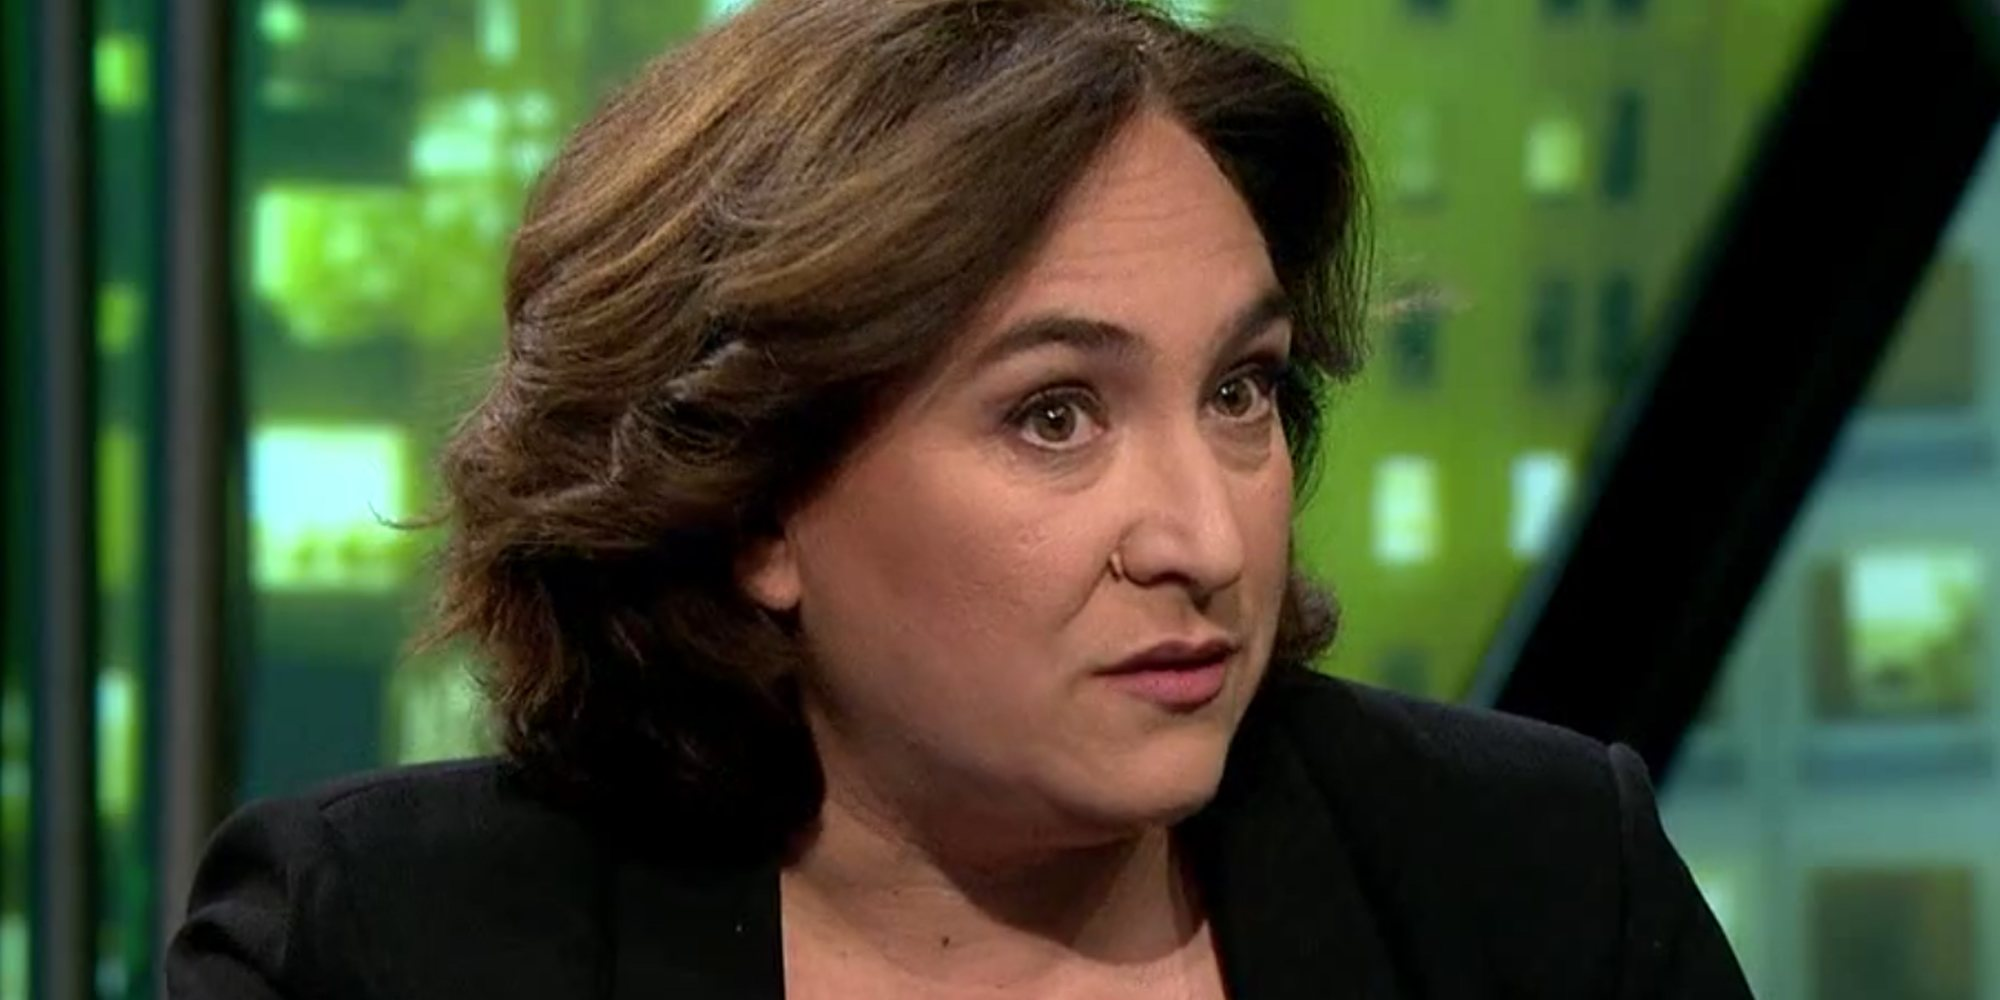 Ada Colau sale de fiesta por Chueca tras defender a Pablo Iglesias e Irene Montero en 'laSexta Noche'